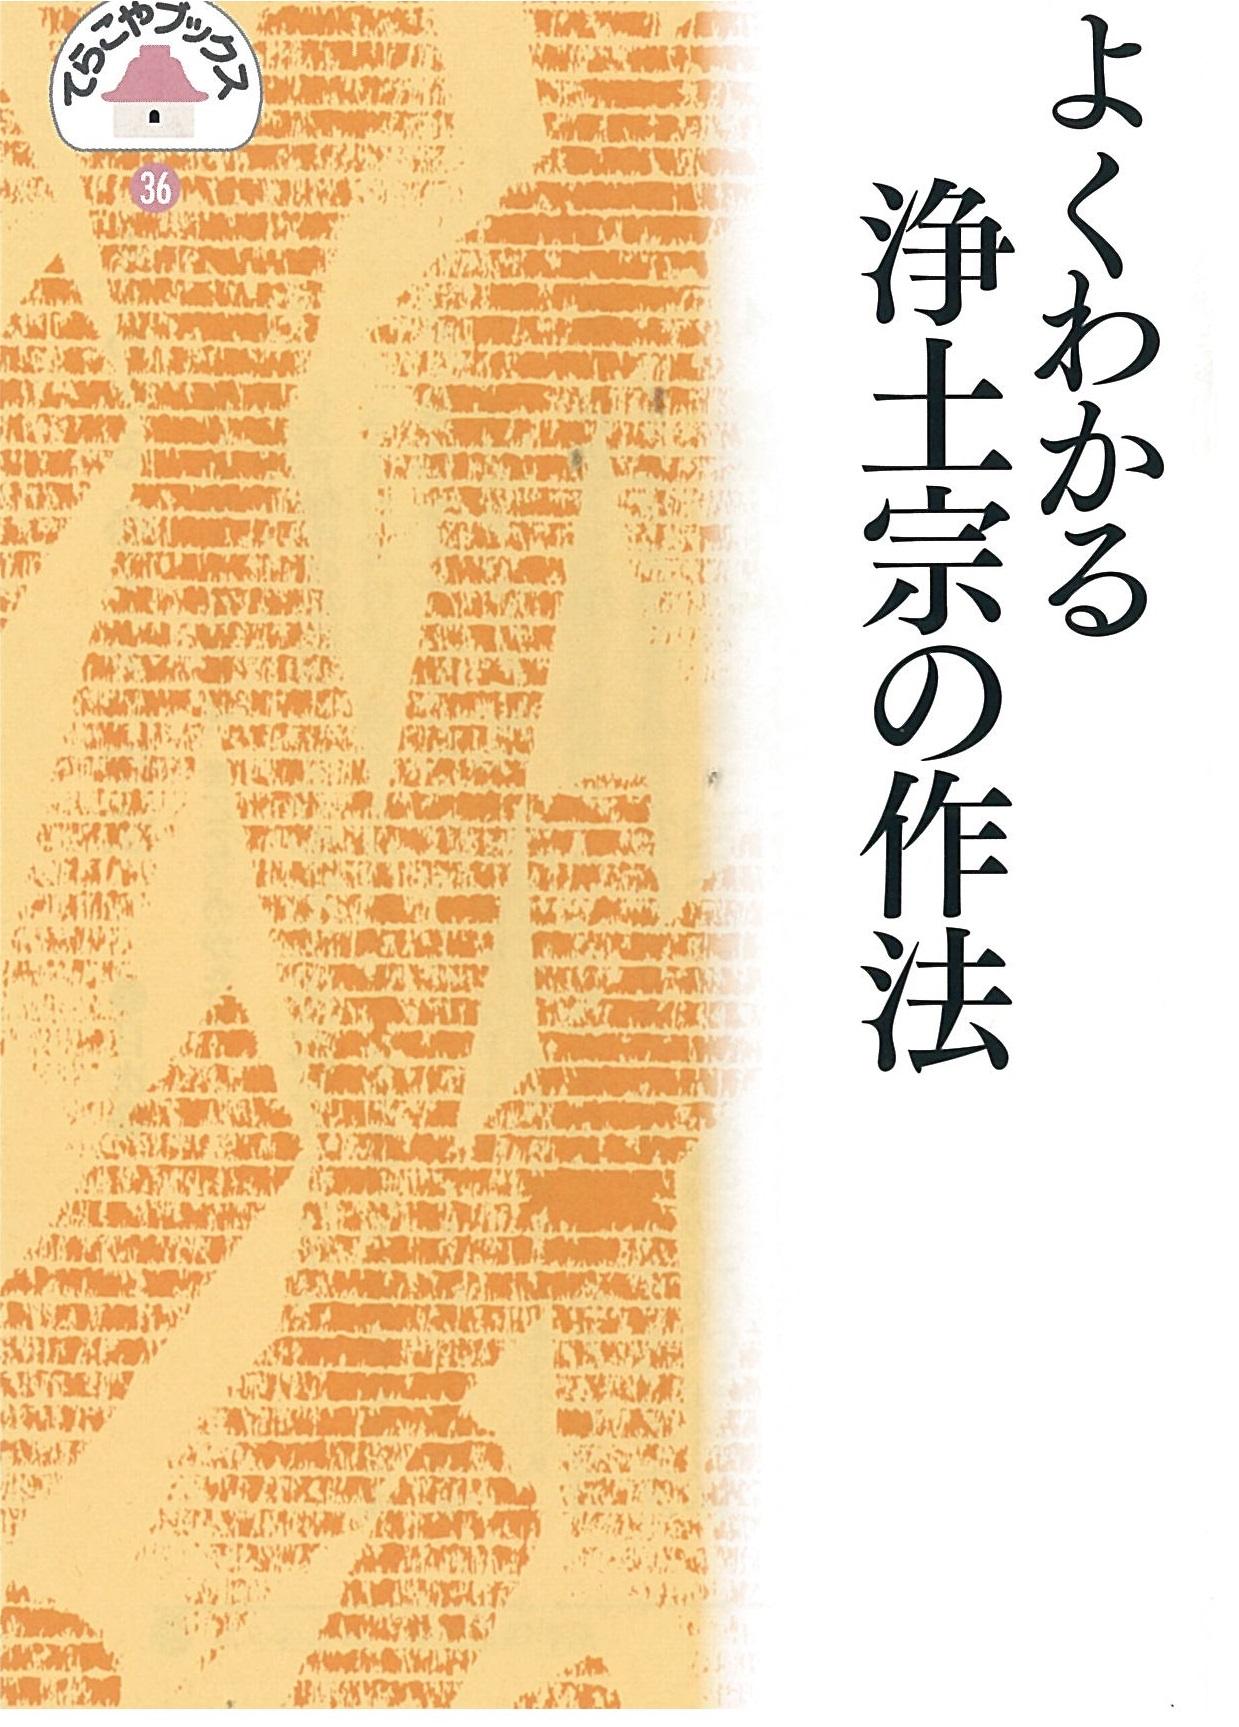 TB36よくわかる浄土宗の作法.jpg